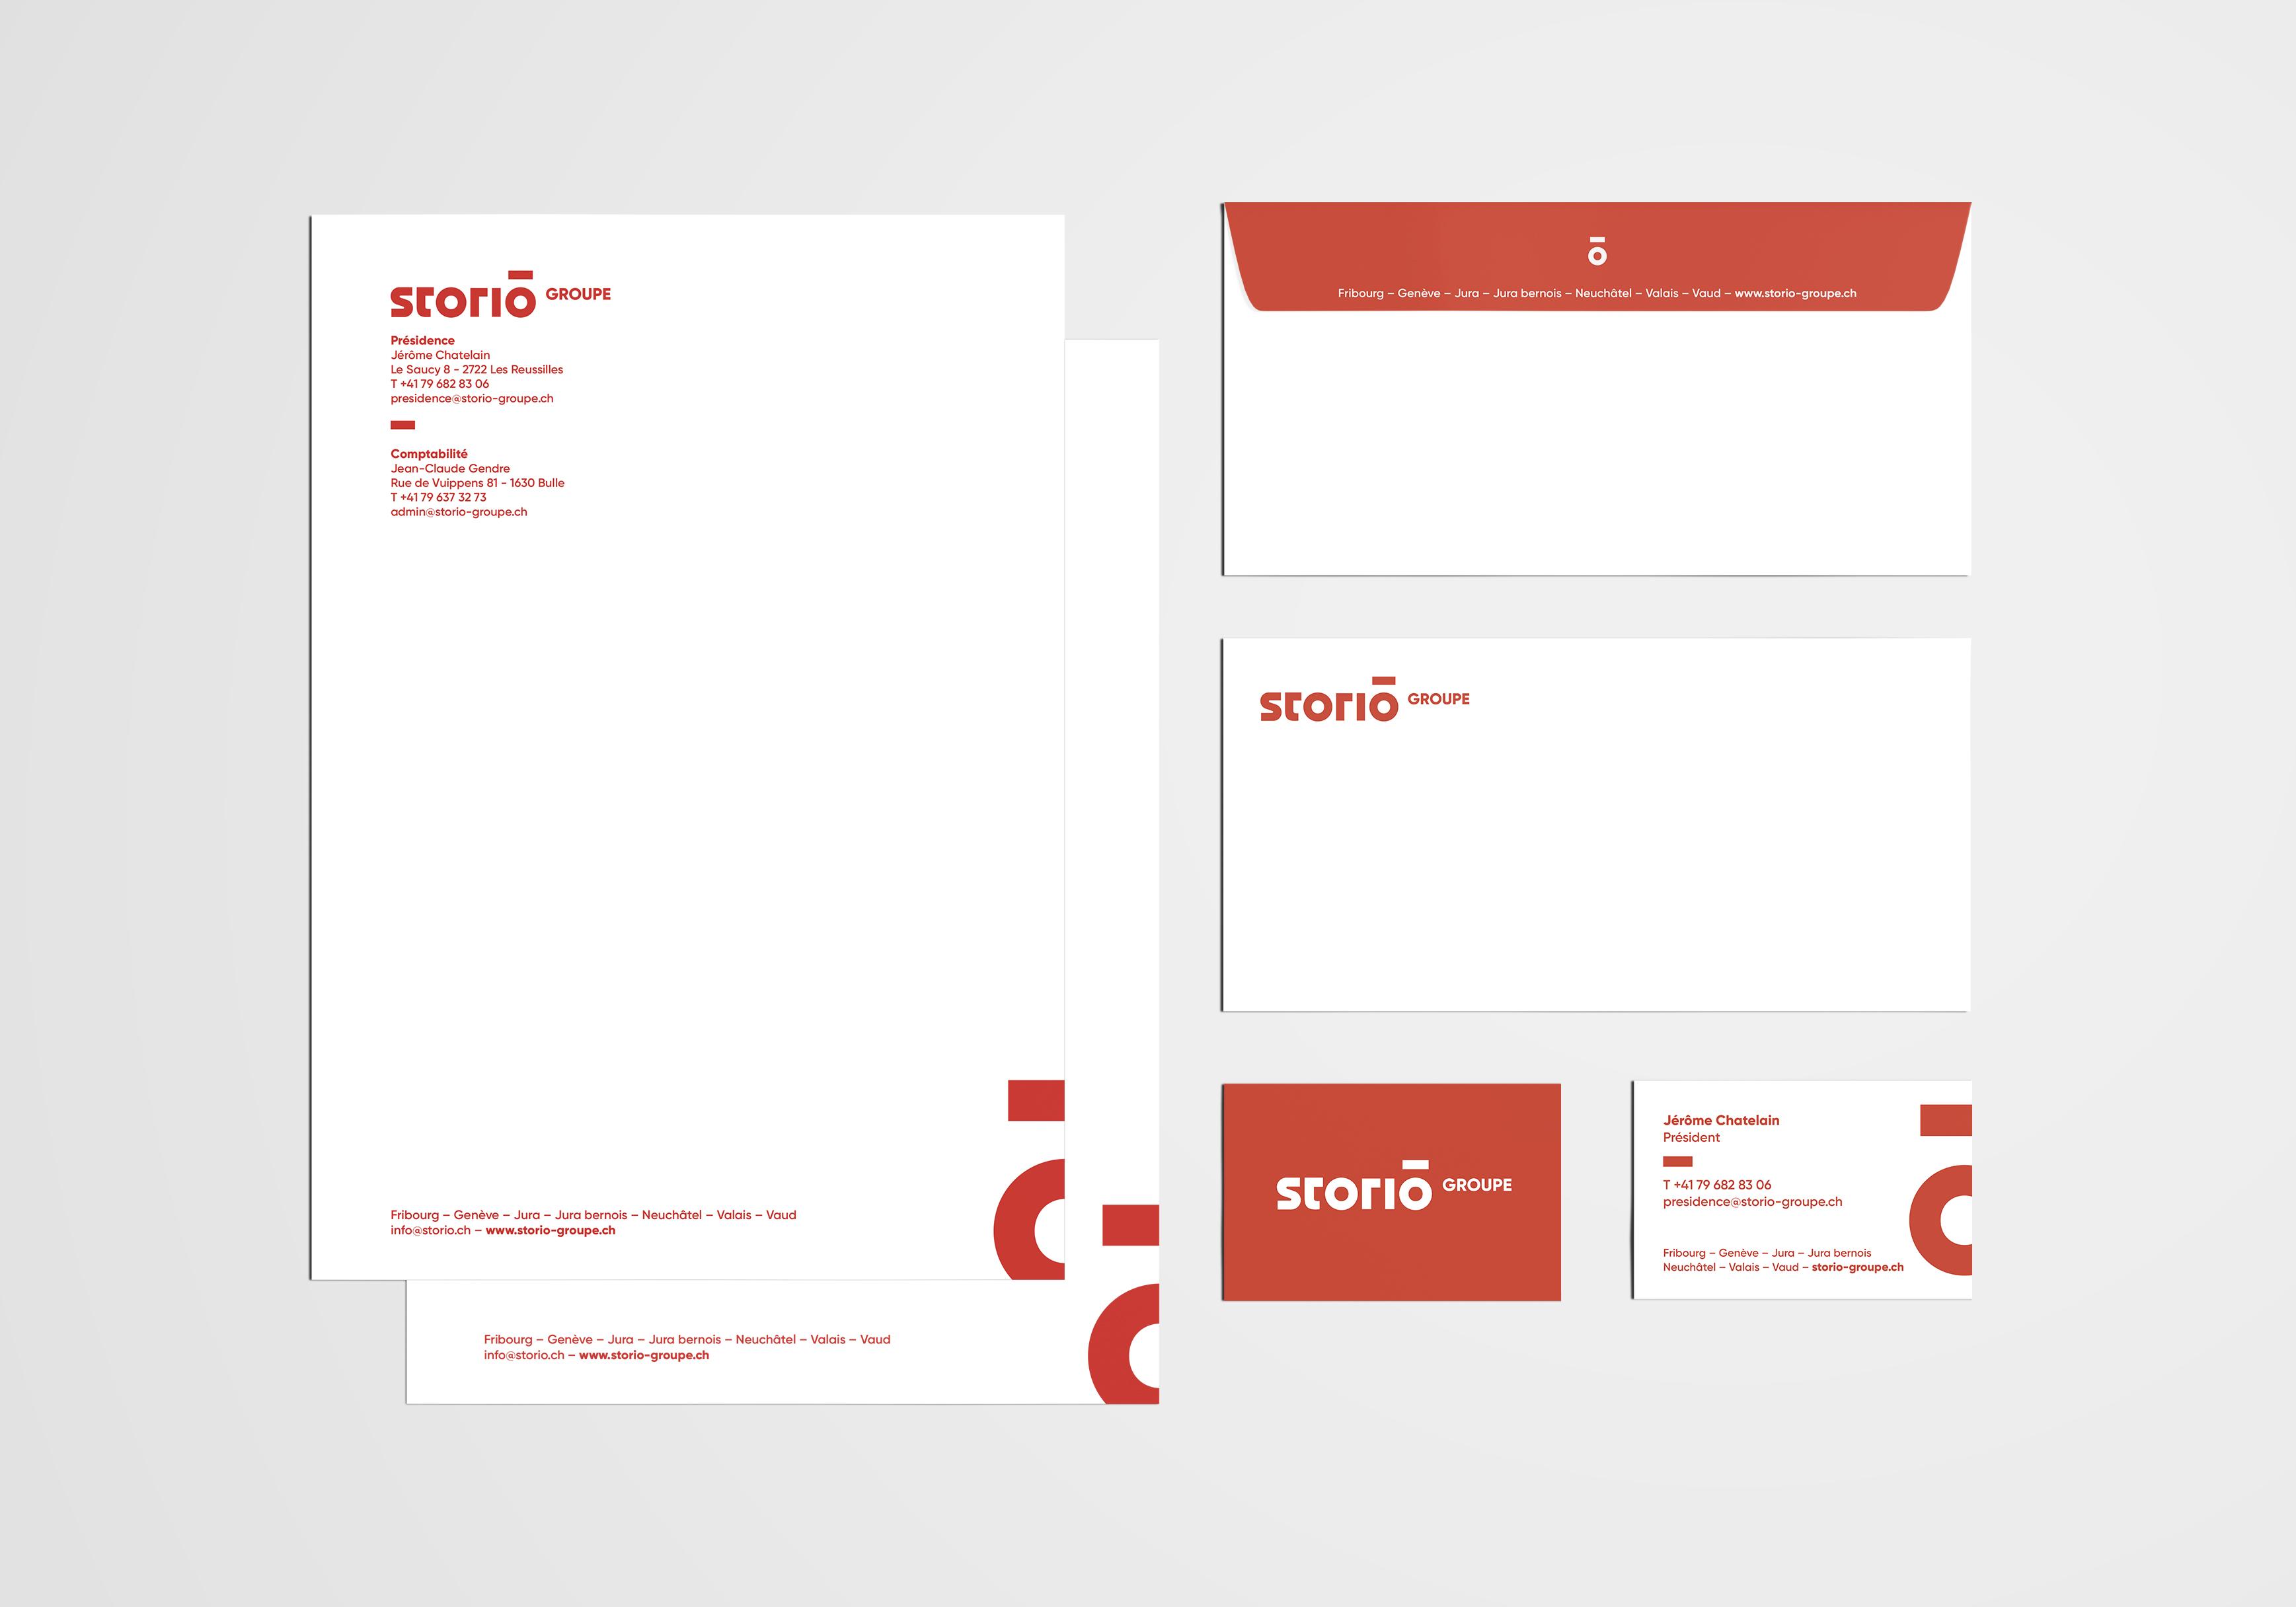 Storio Groupe